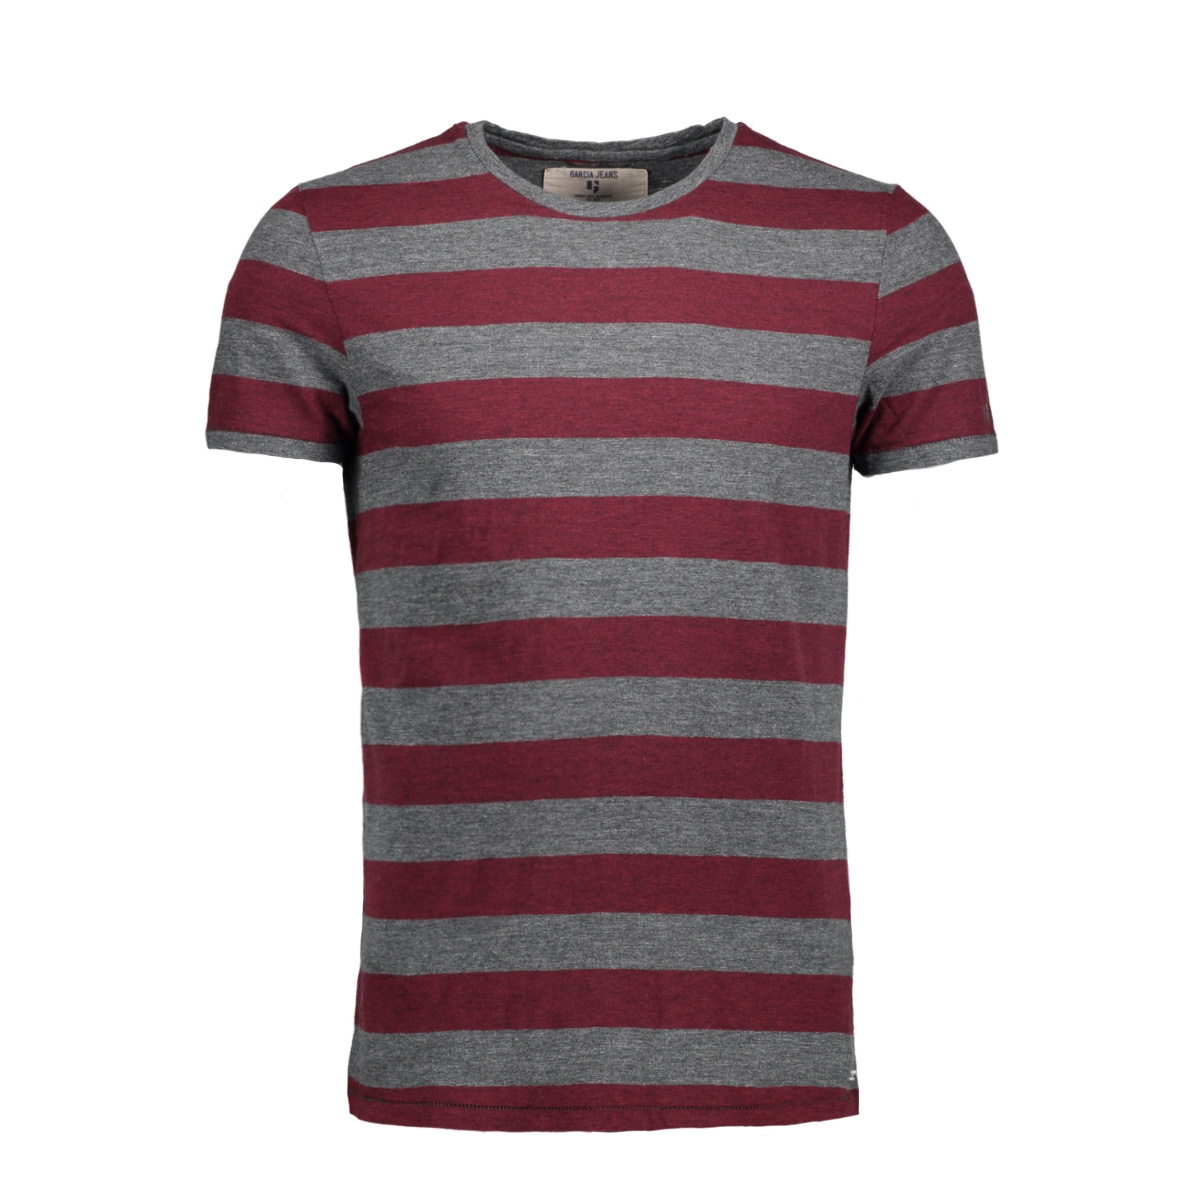 j71208 garcia t-shirt 825 classico